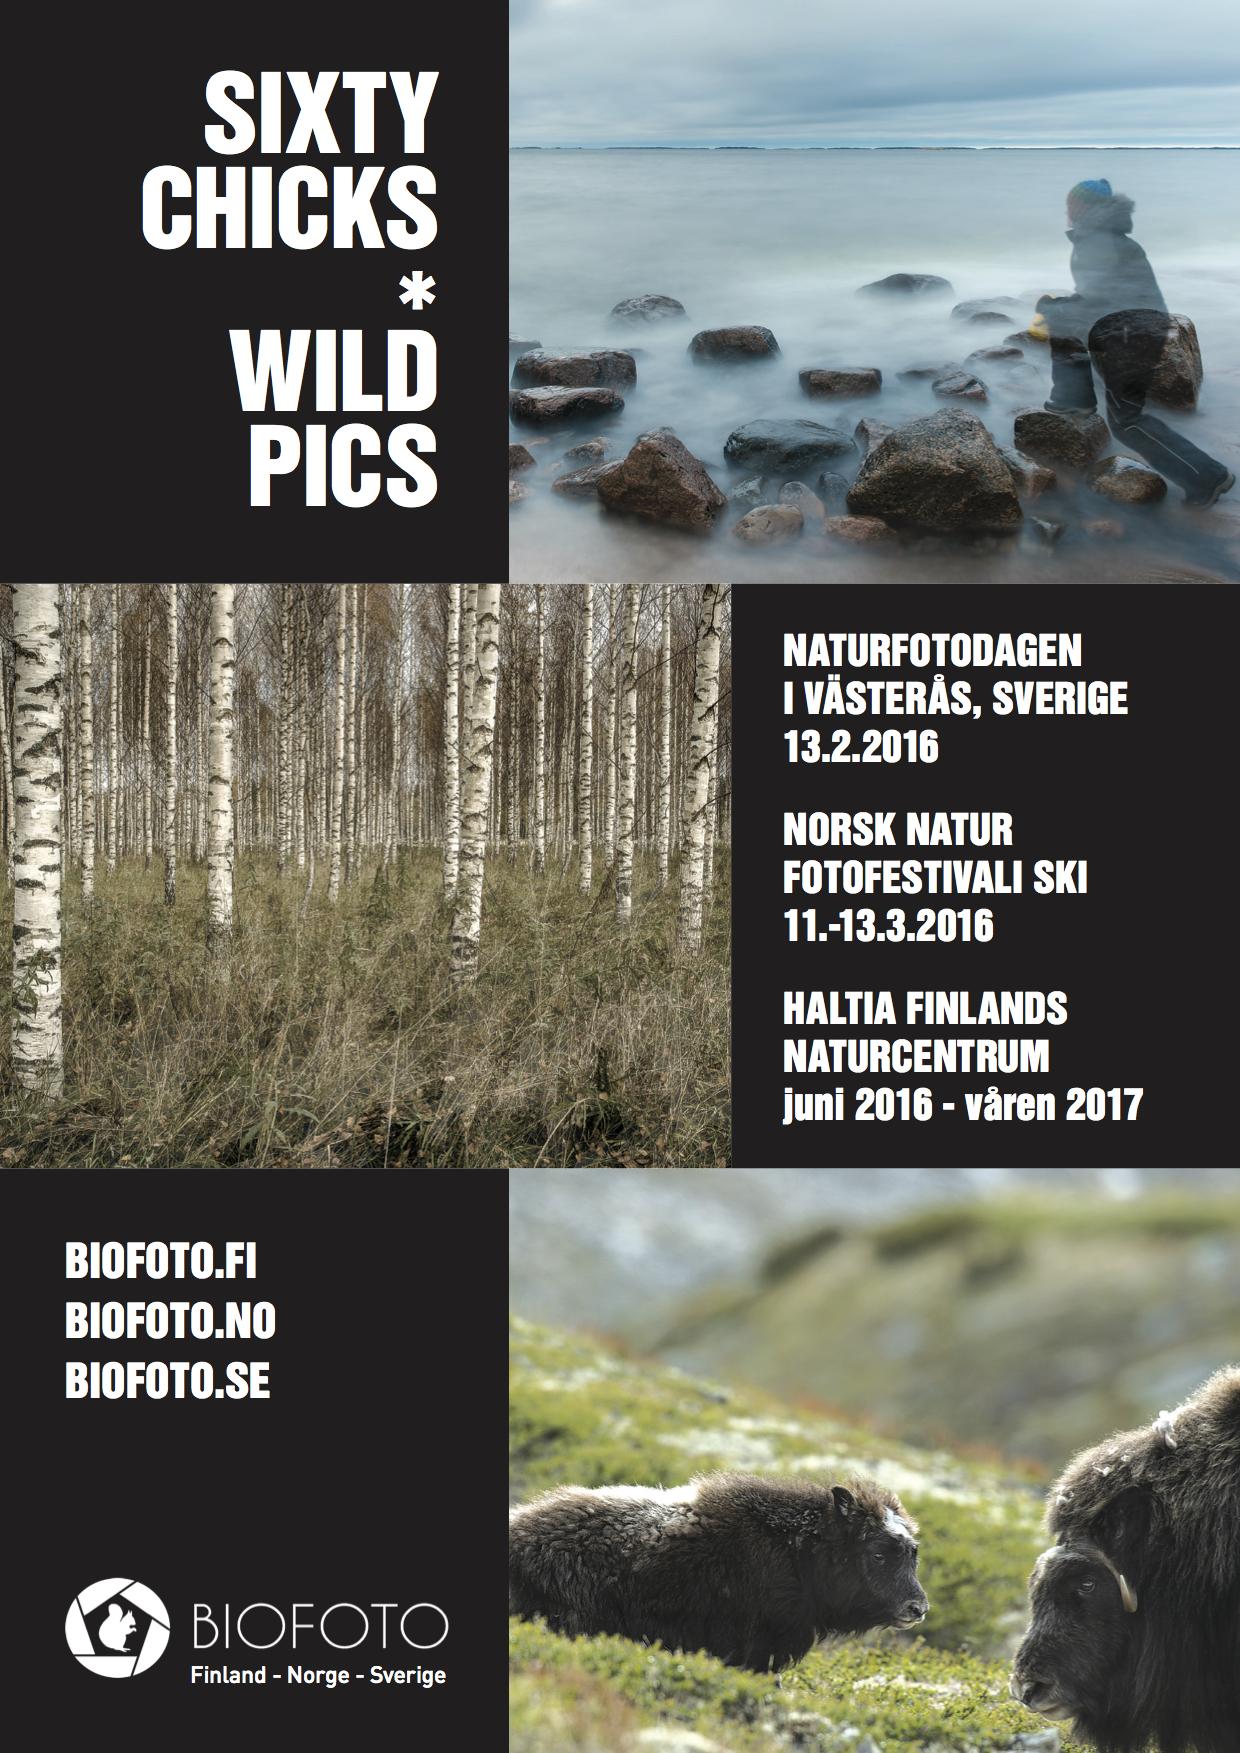 Sixty Chicks & Wild Pics